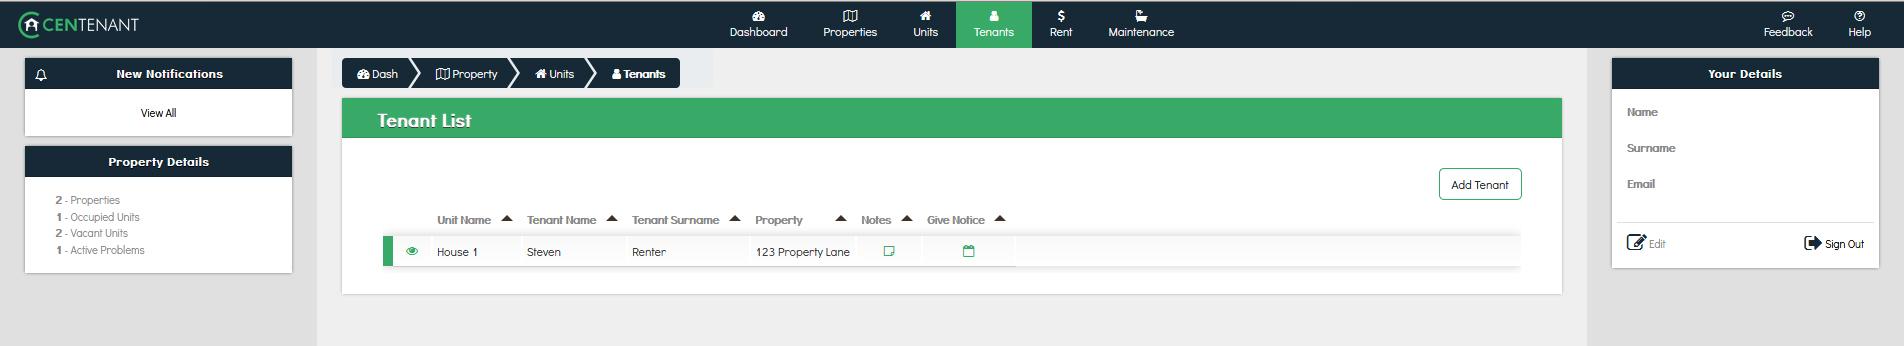 Centenant online property management Platform - Manage Tenants